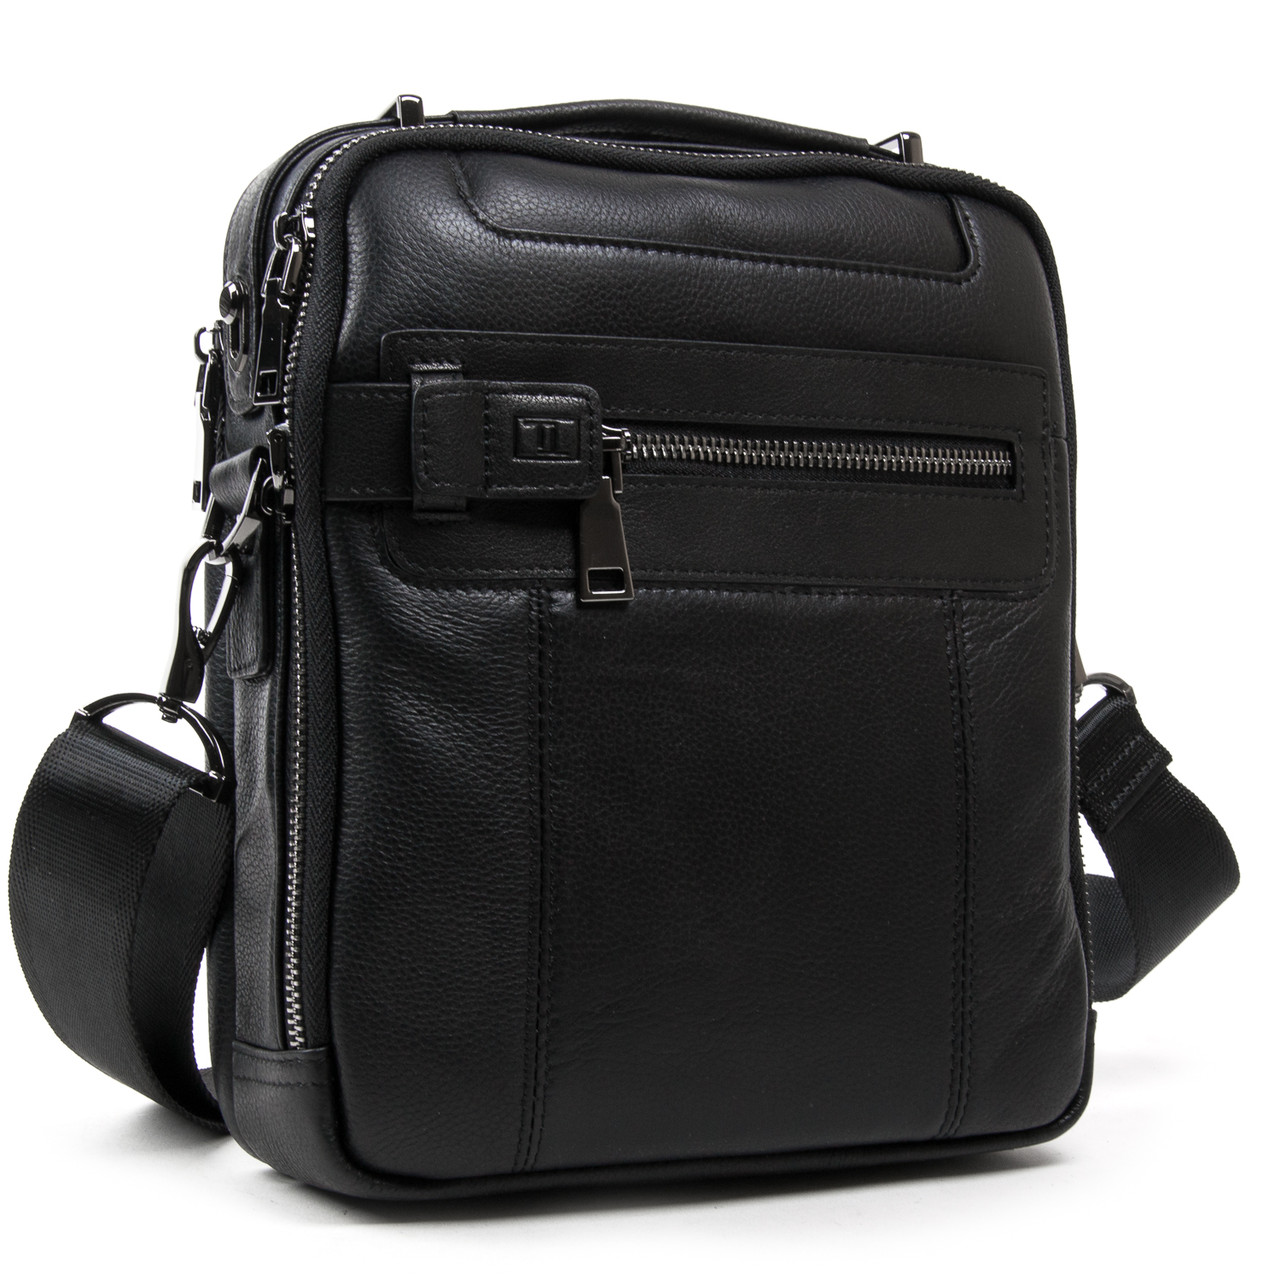 Стильна чоловіча сумка планшет натуральна шкіра BRETTON